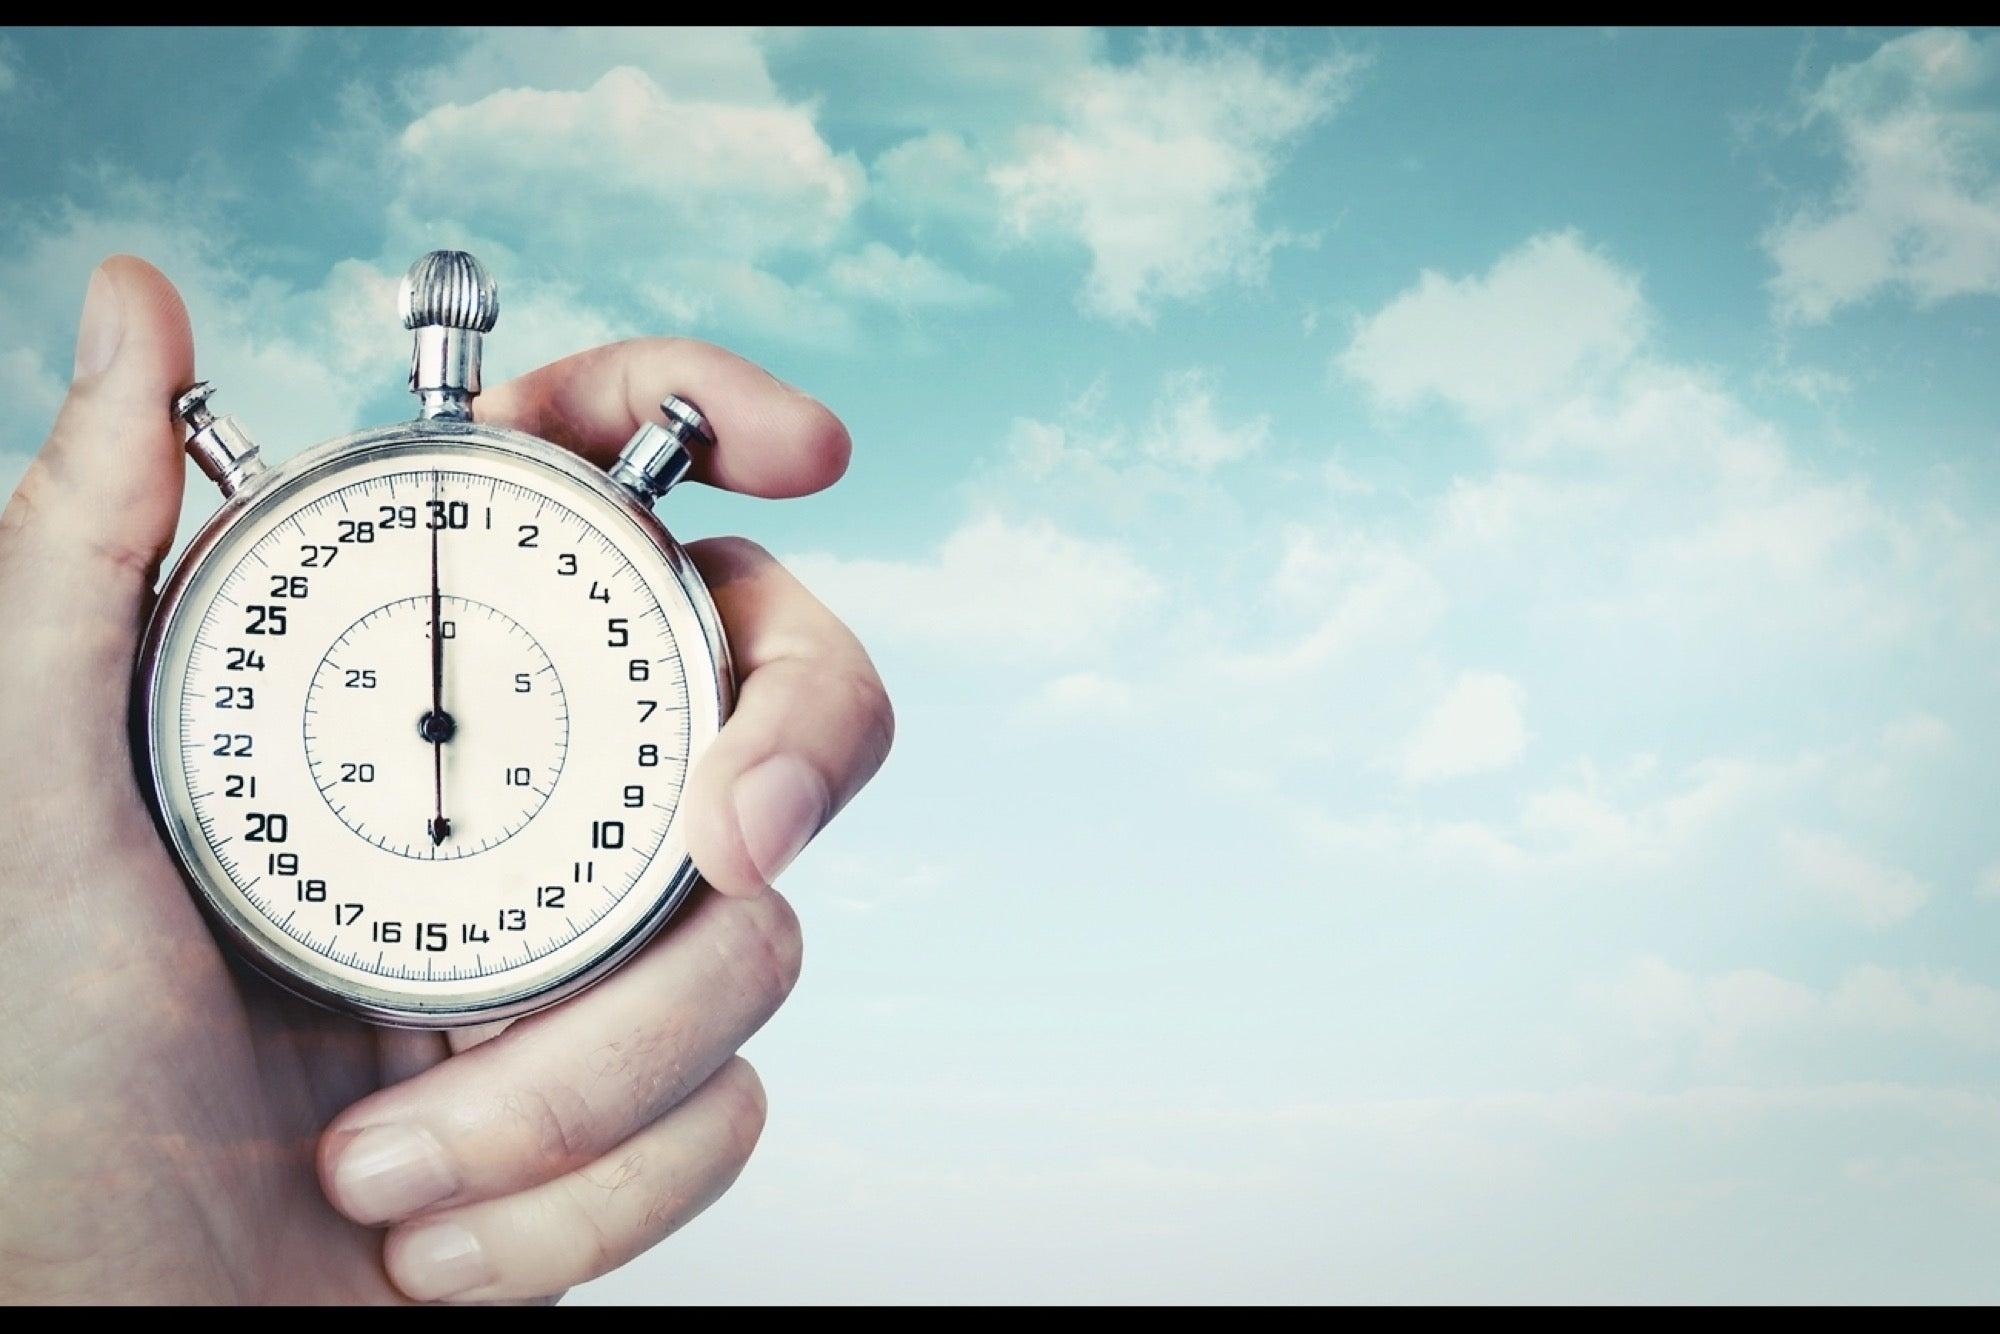 فعالیت بر حسب زمان